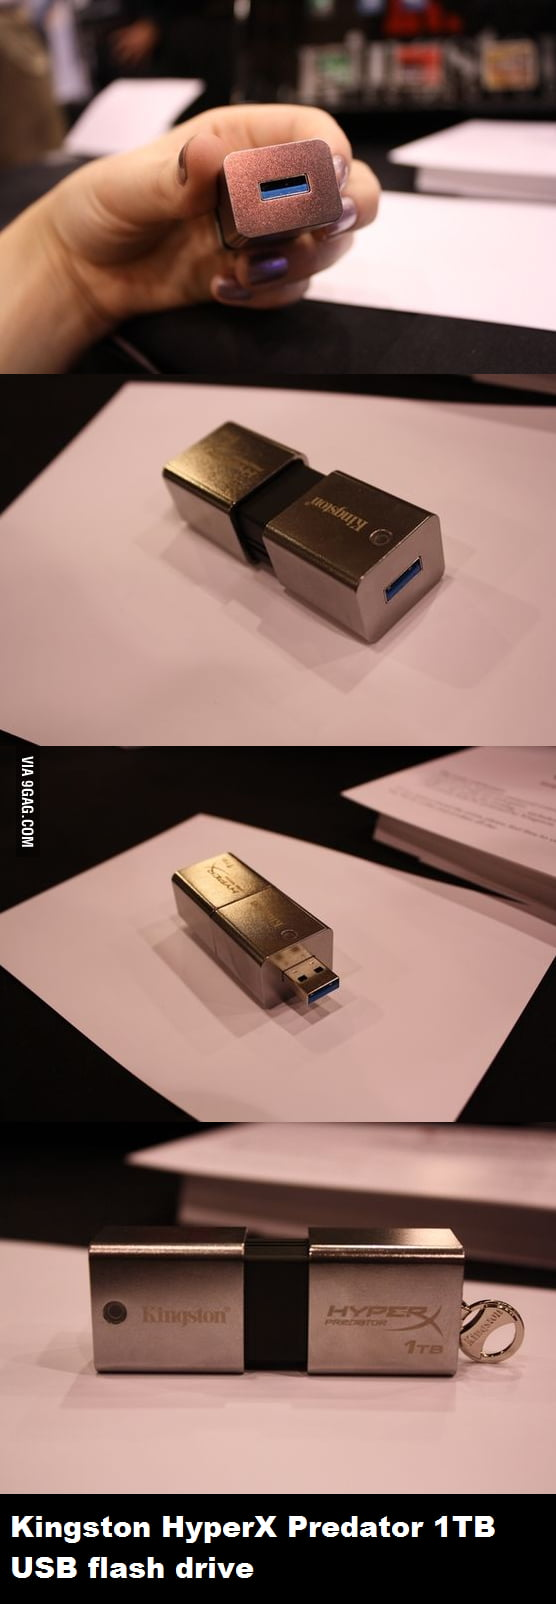 1 terabyte USB stick